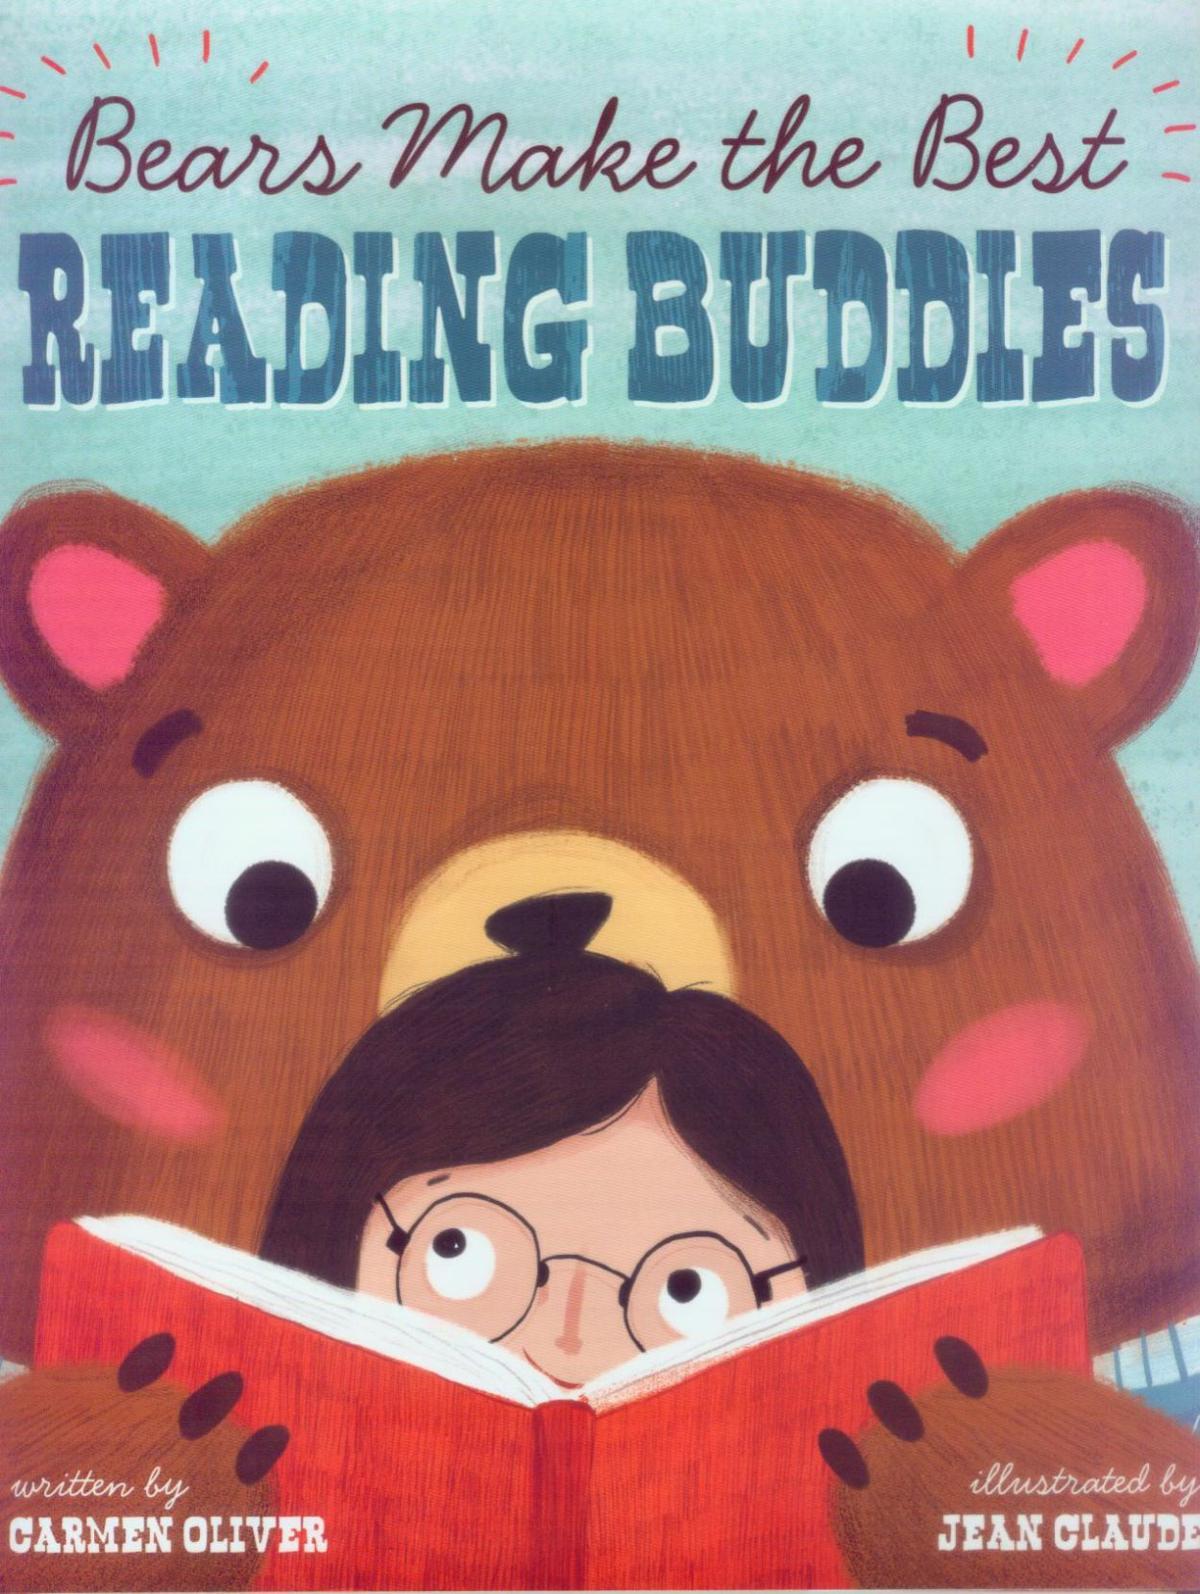 New children's books from three Texas authors